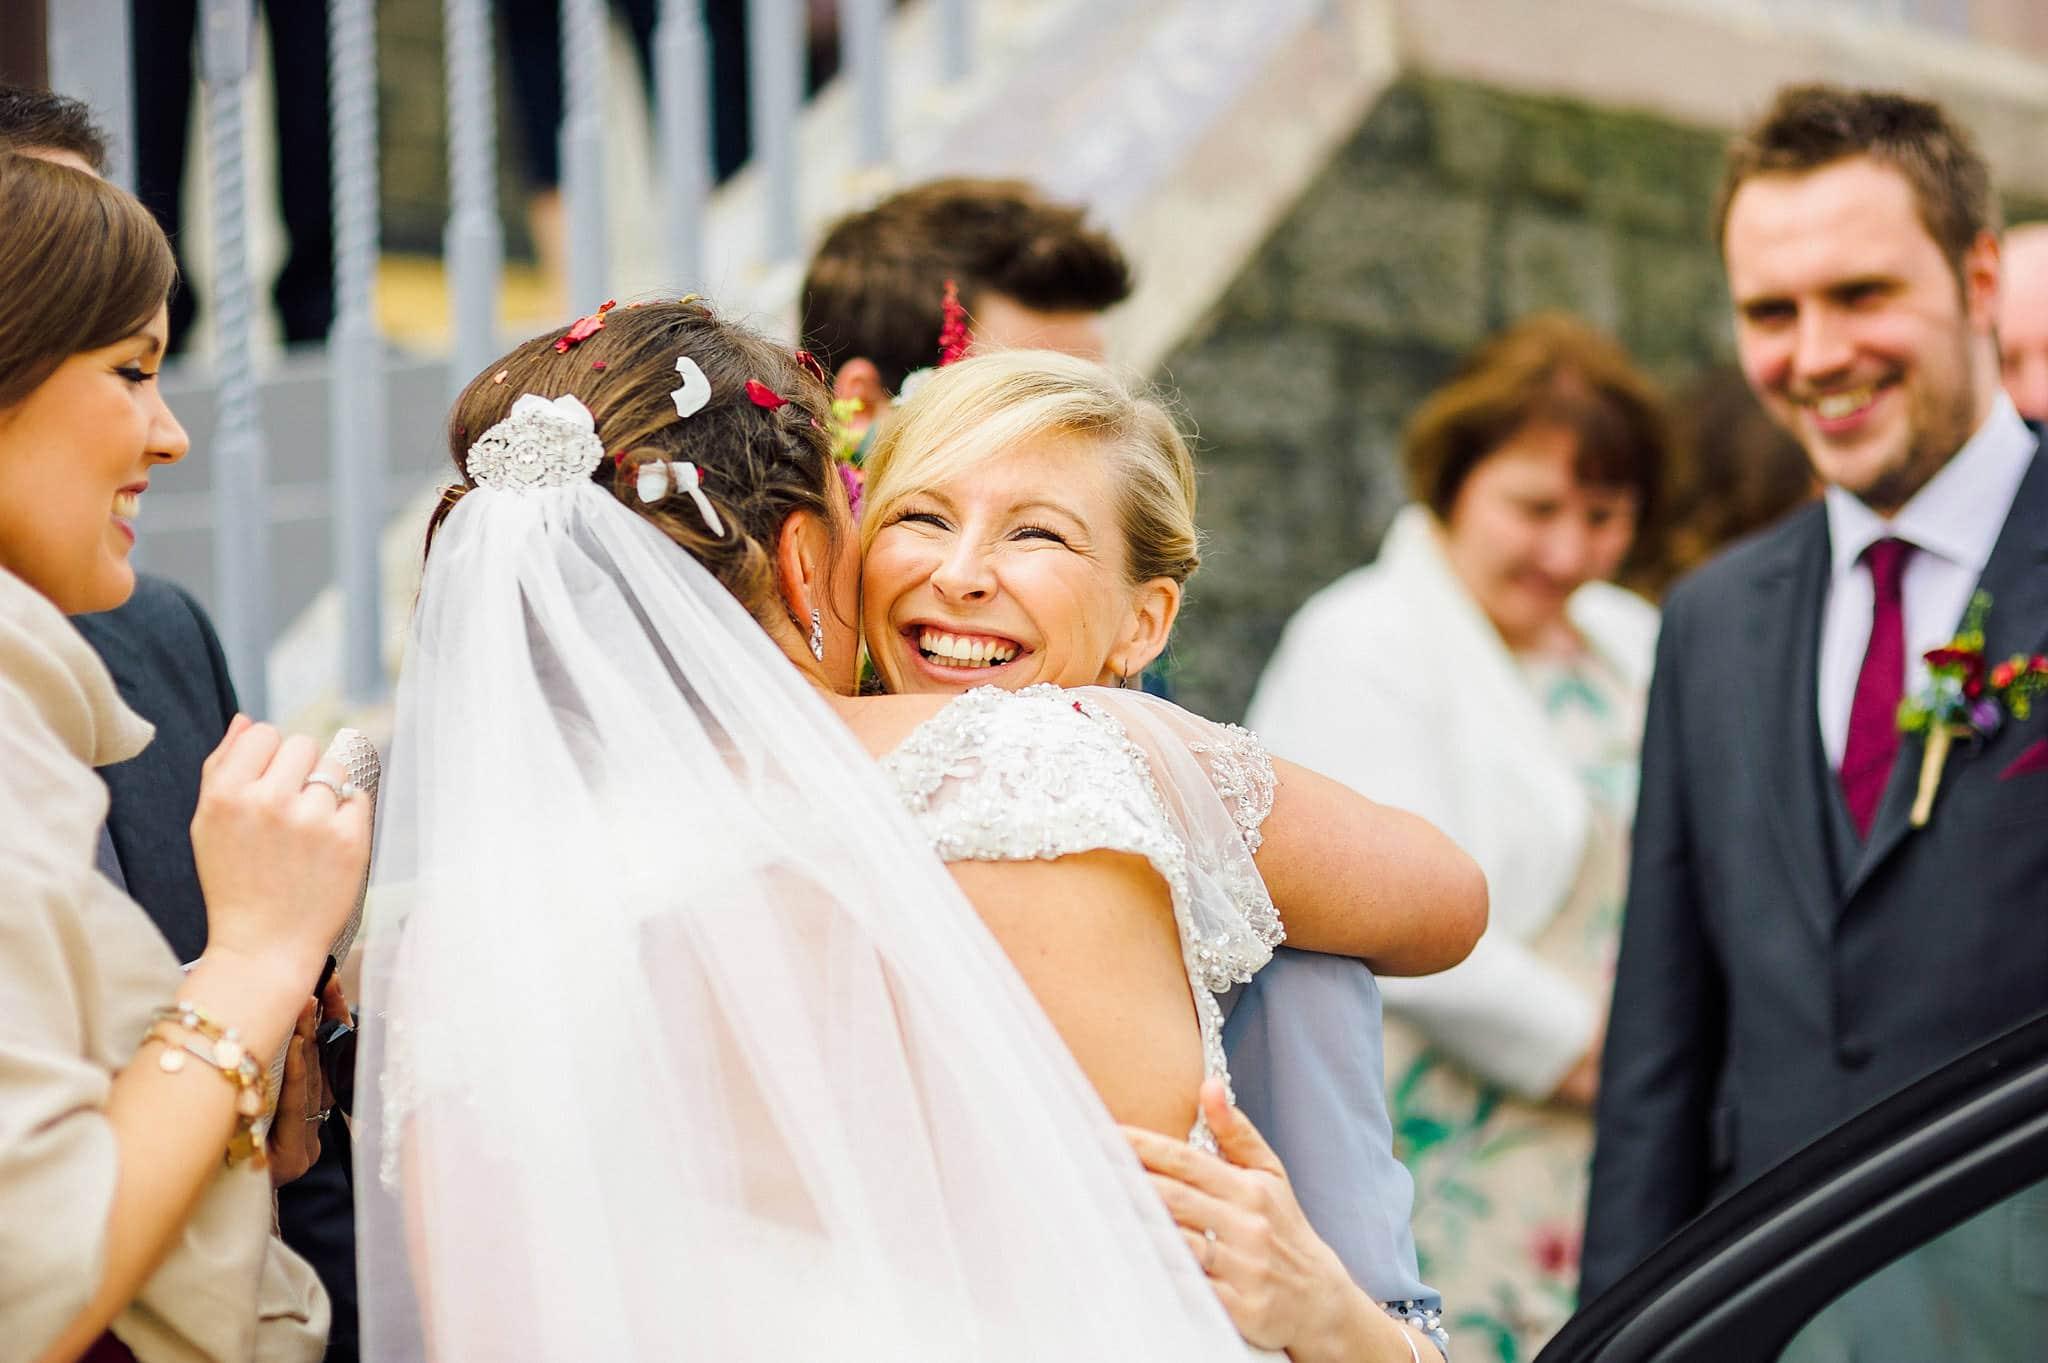 wedding-photographer-aberystwyth-wales (88)